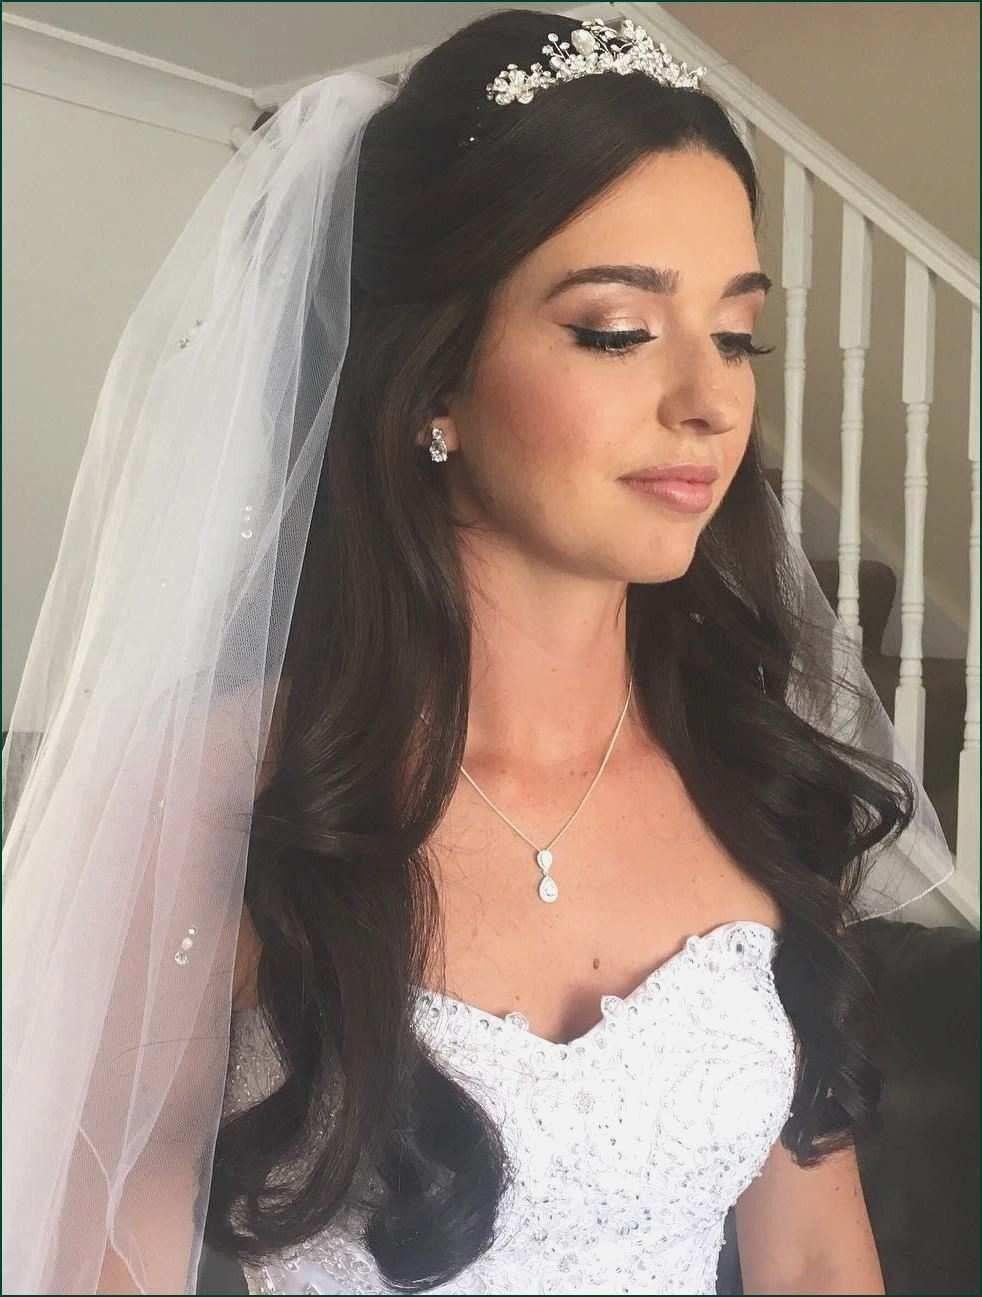 Half Up Half Down Wedding Hairstyles With Veil Awesome G54w Bridal Model Rambut Pengantin Gaya Rambut Pengantin Rambut Pengantin